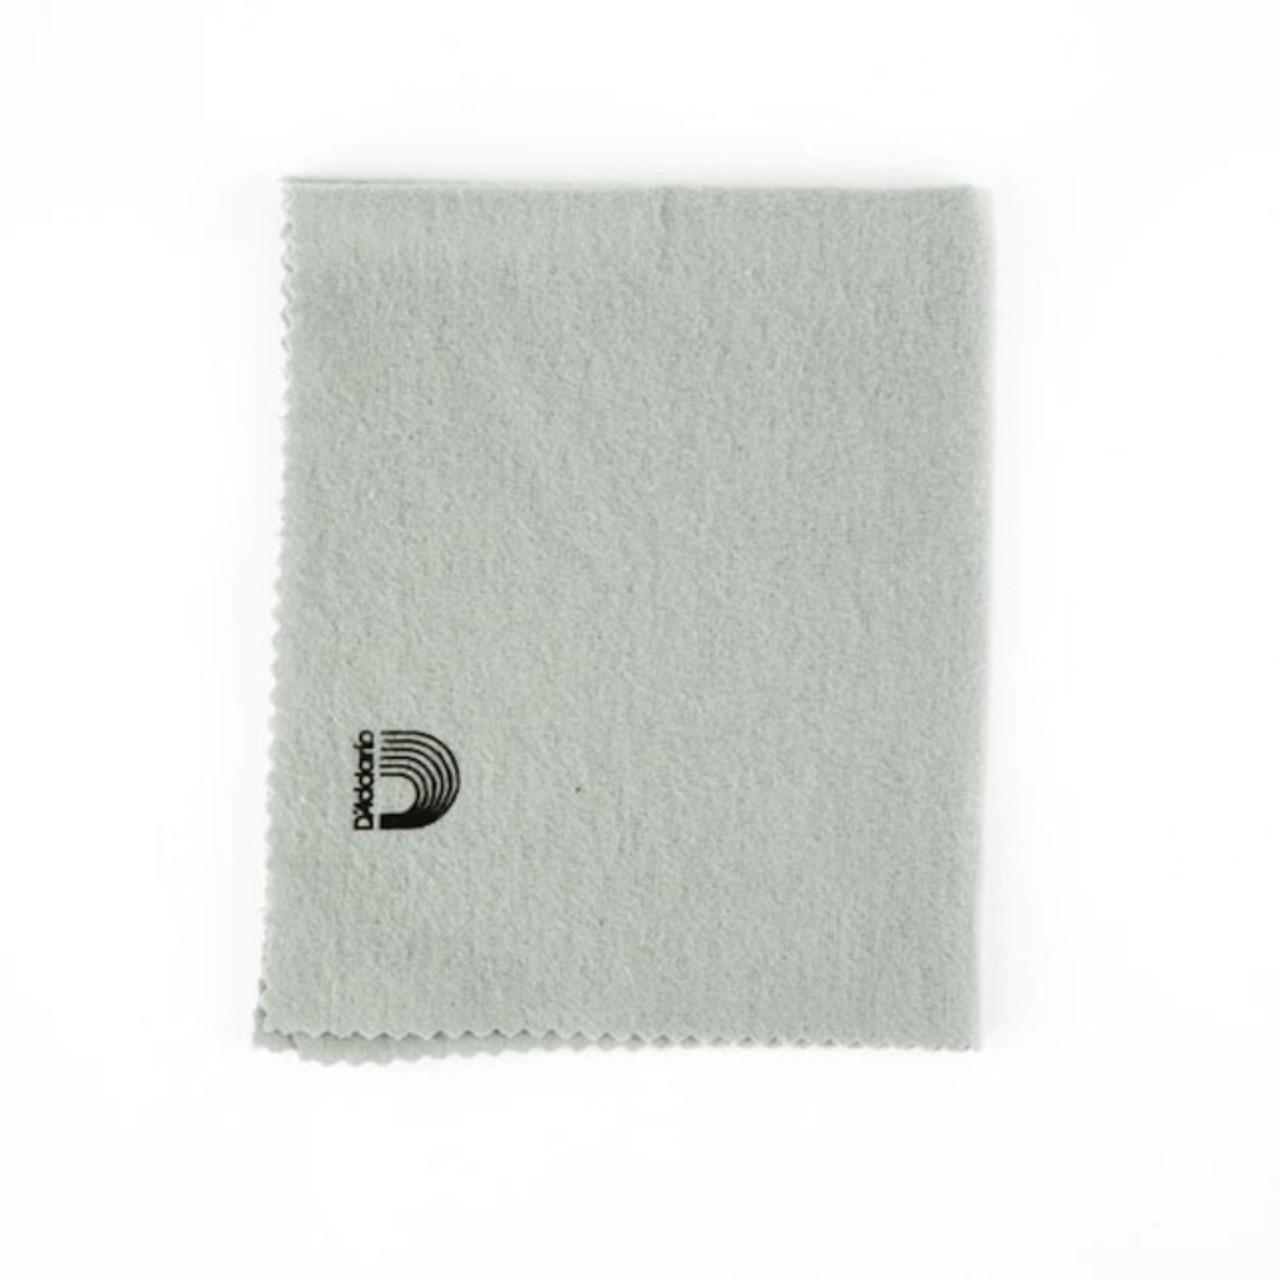 D'addario Pre-Treated Polish Cloth